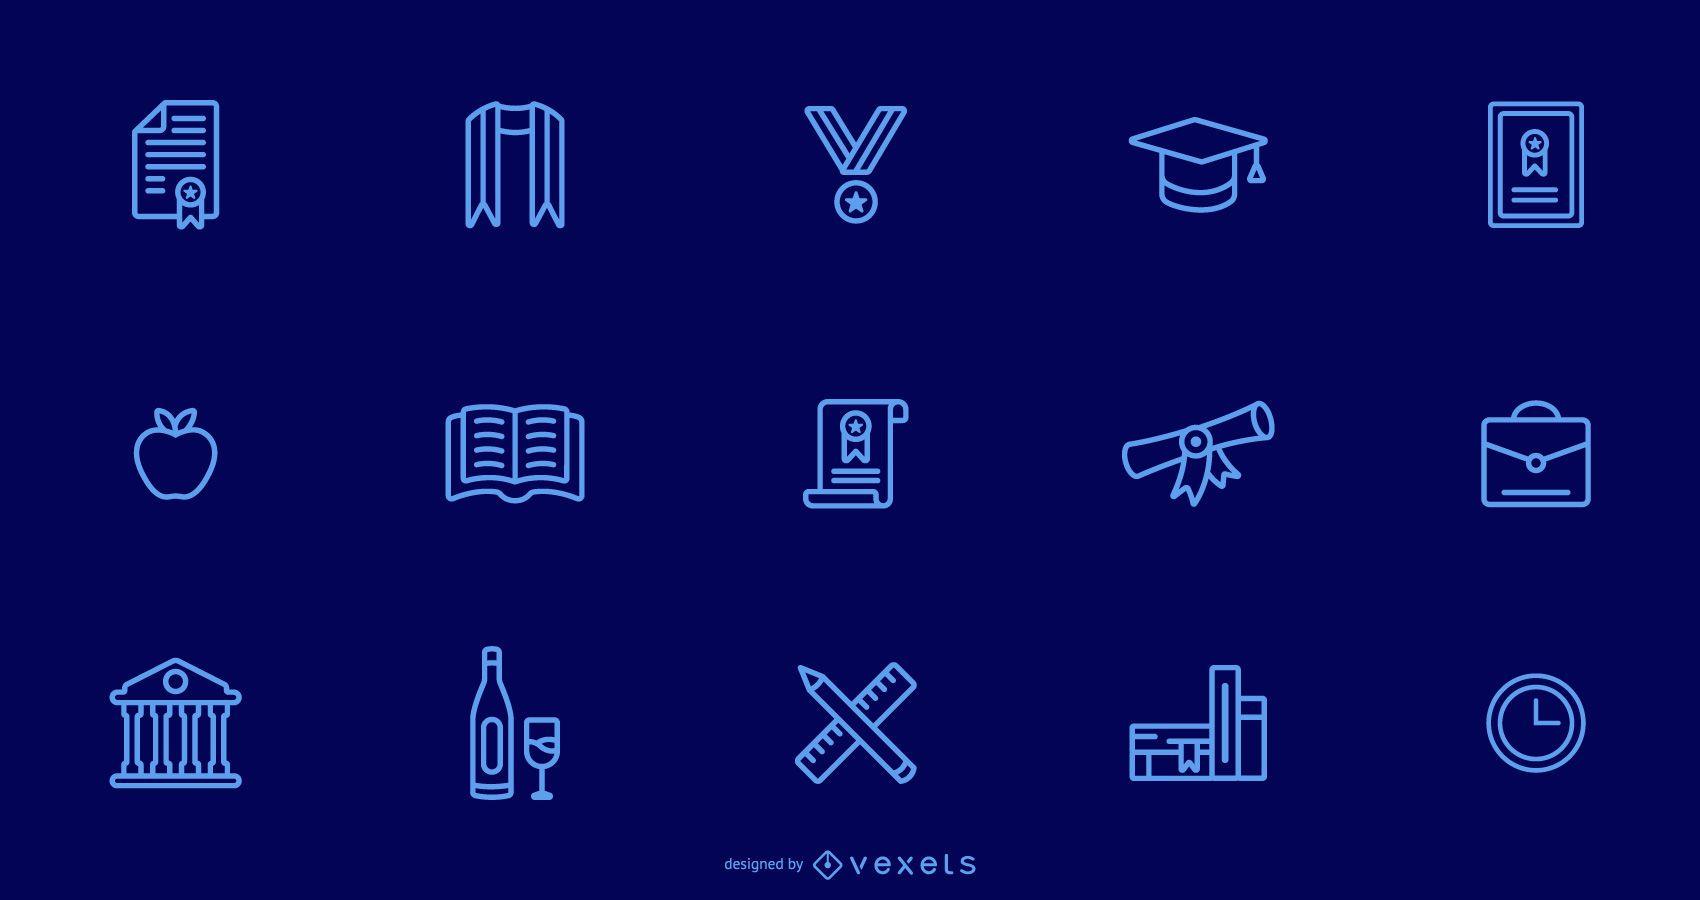 Graduation icon stroke collection